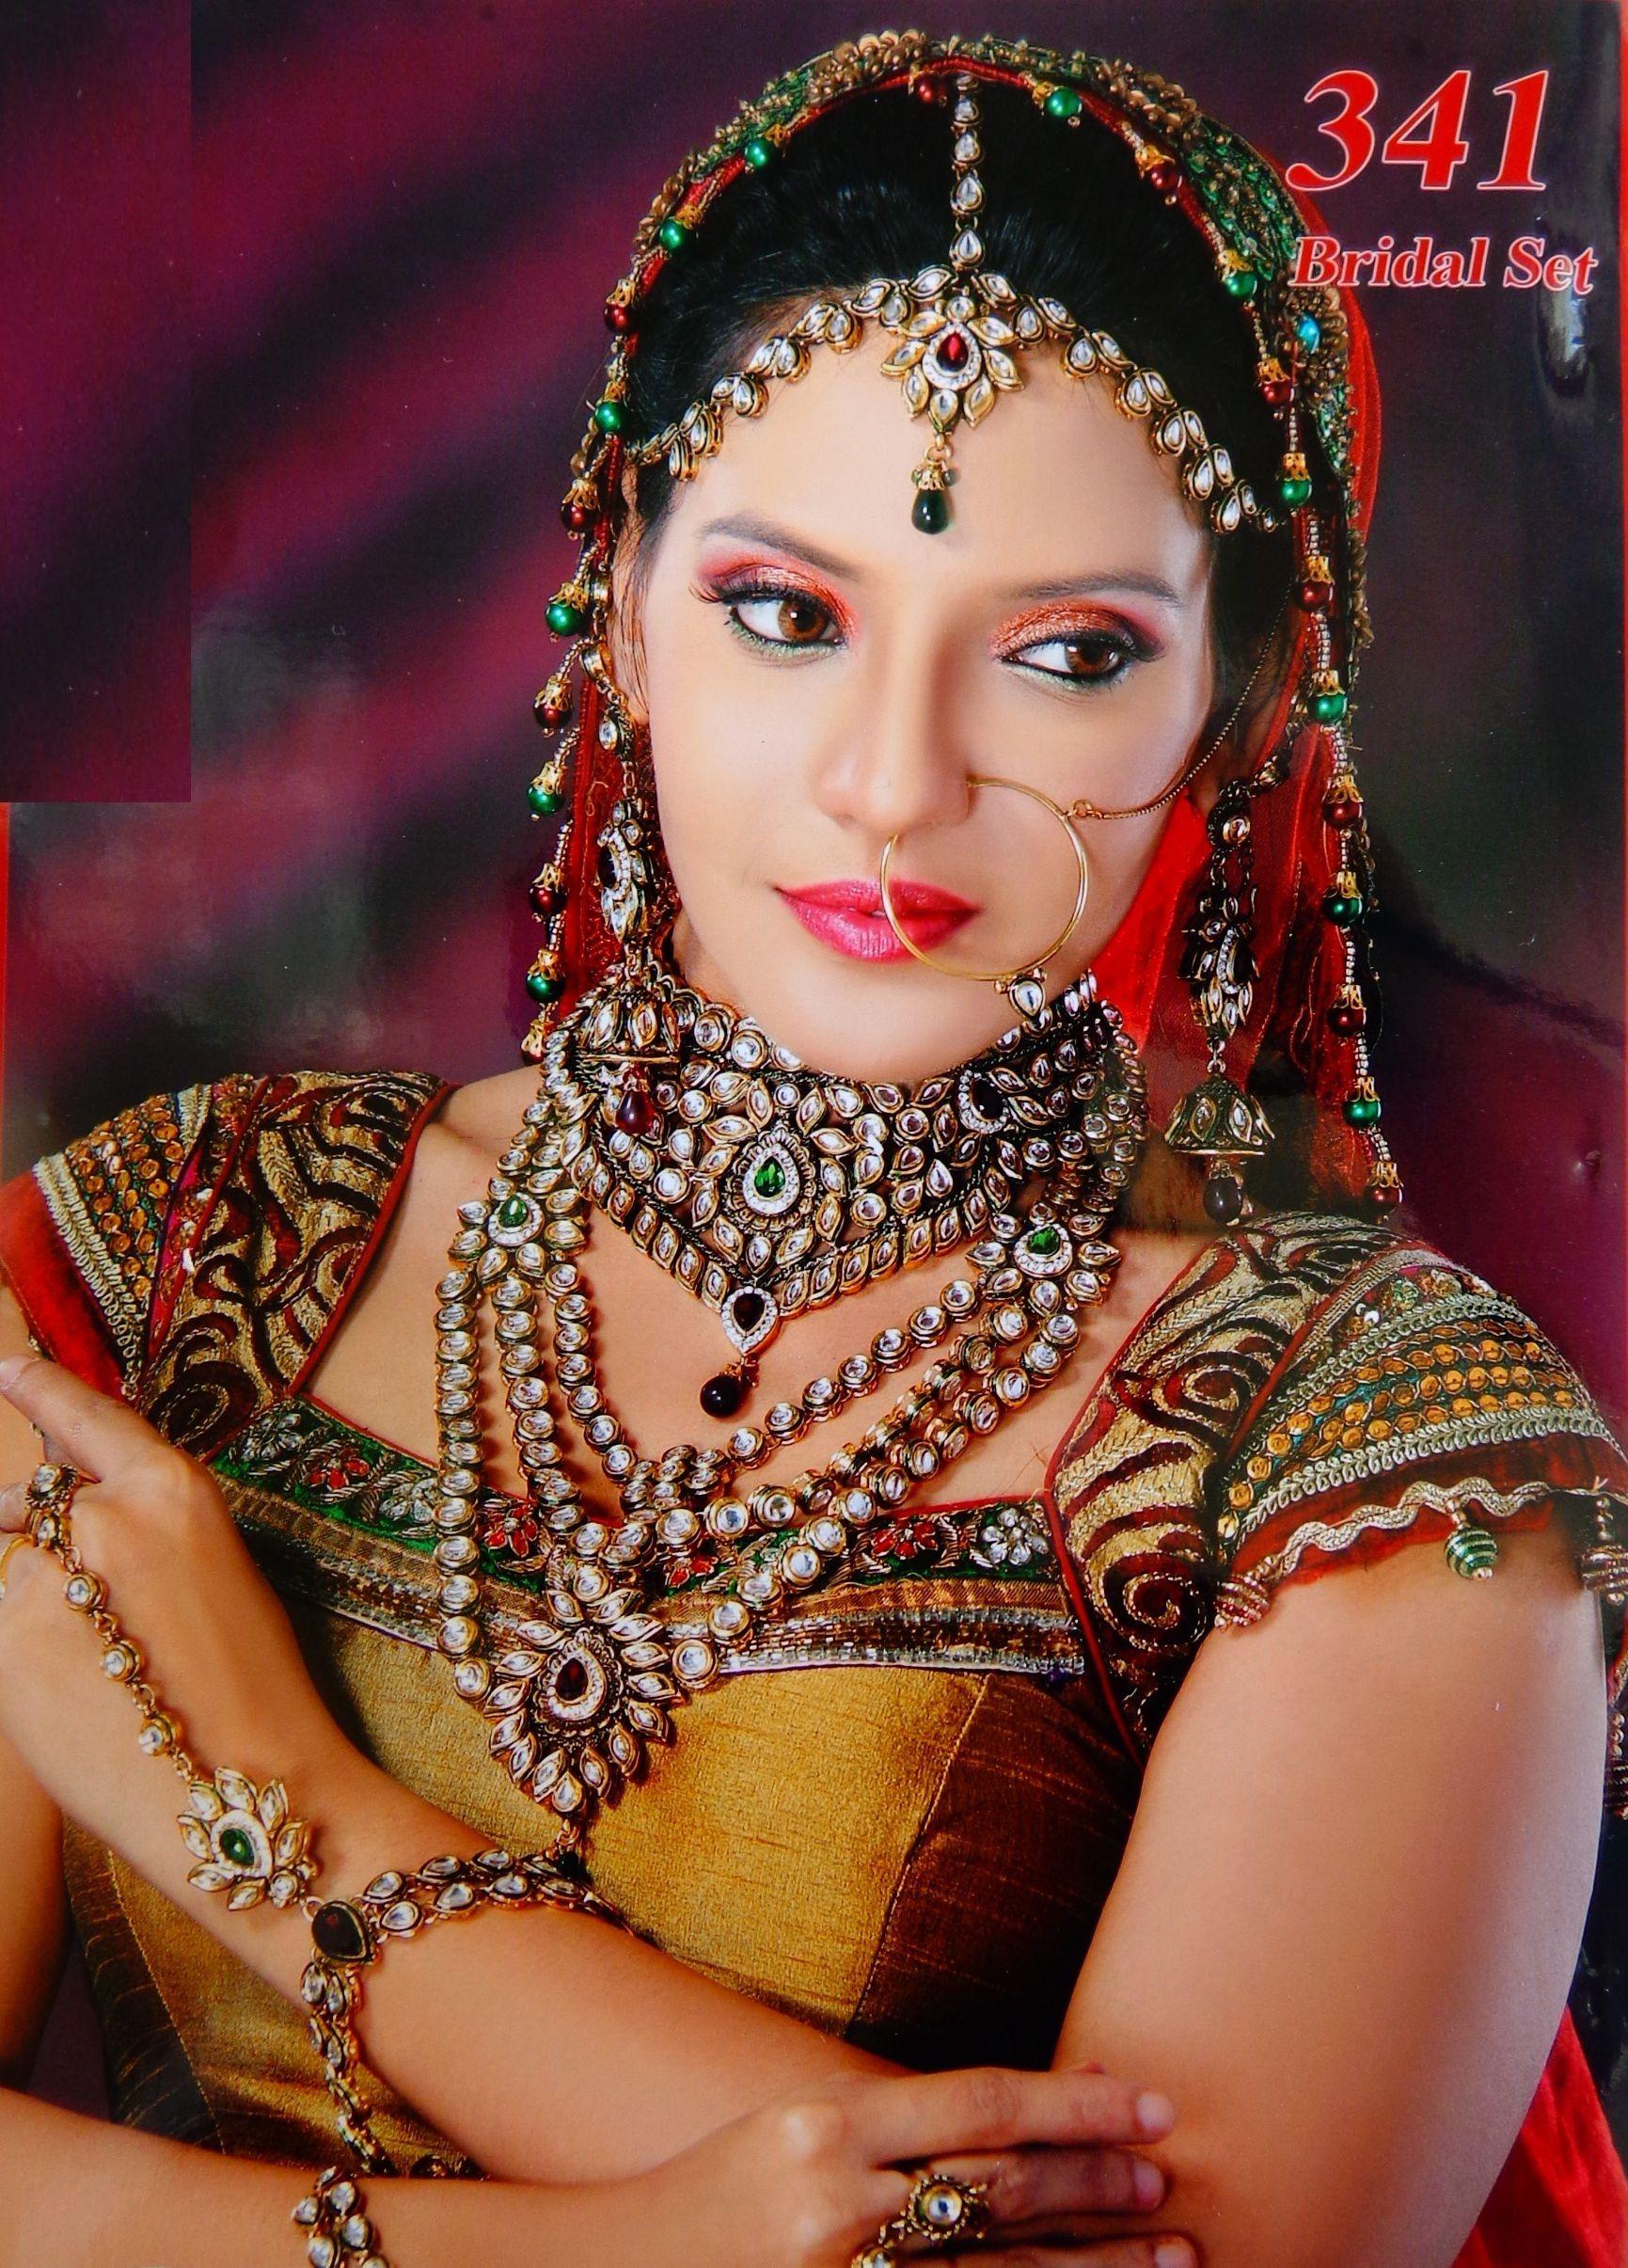 Ayyan ali bridal jeweller photo shoot design 2013 for women - Indian Bridal Jewellery Exclusive Bridal Jewellery Set 2015